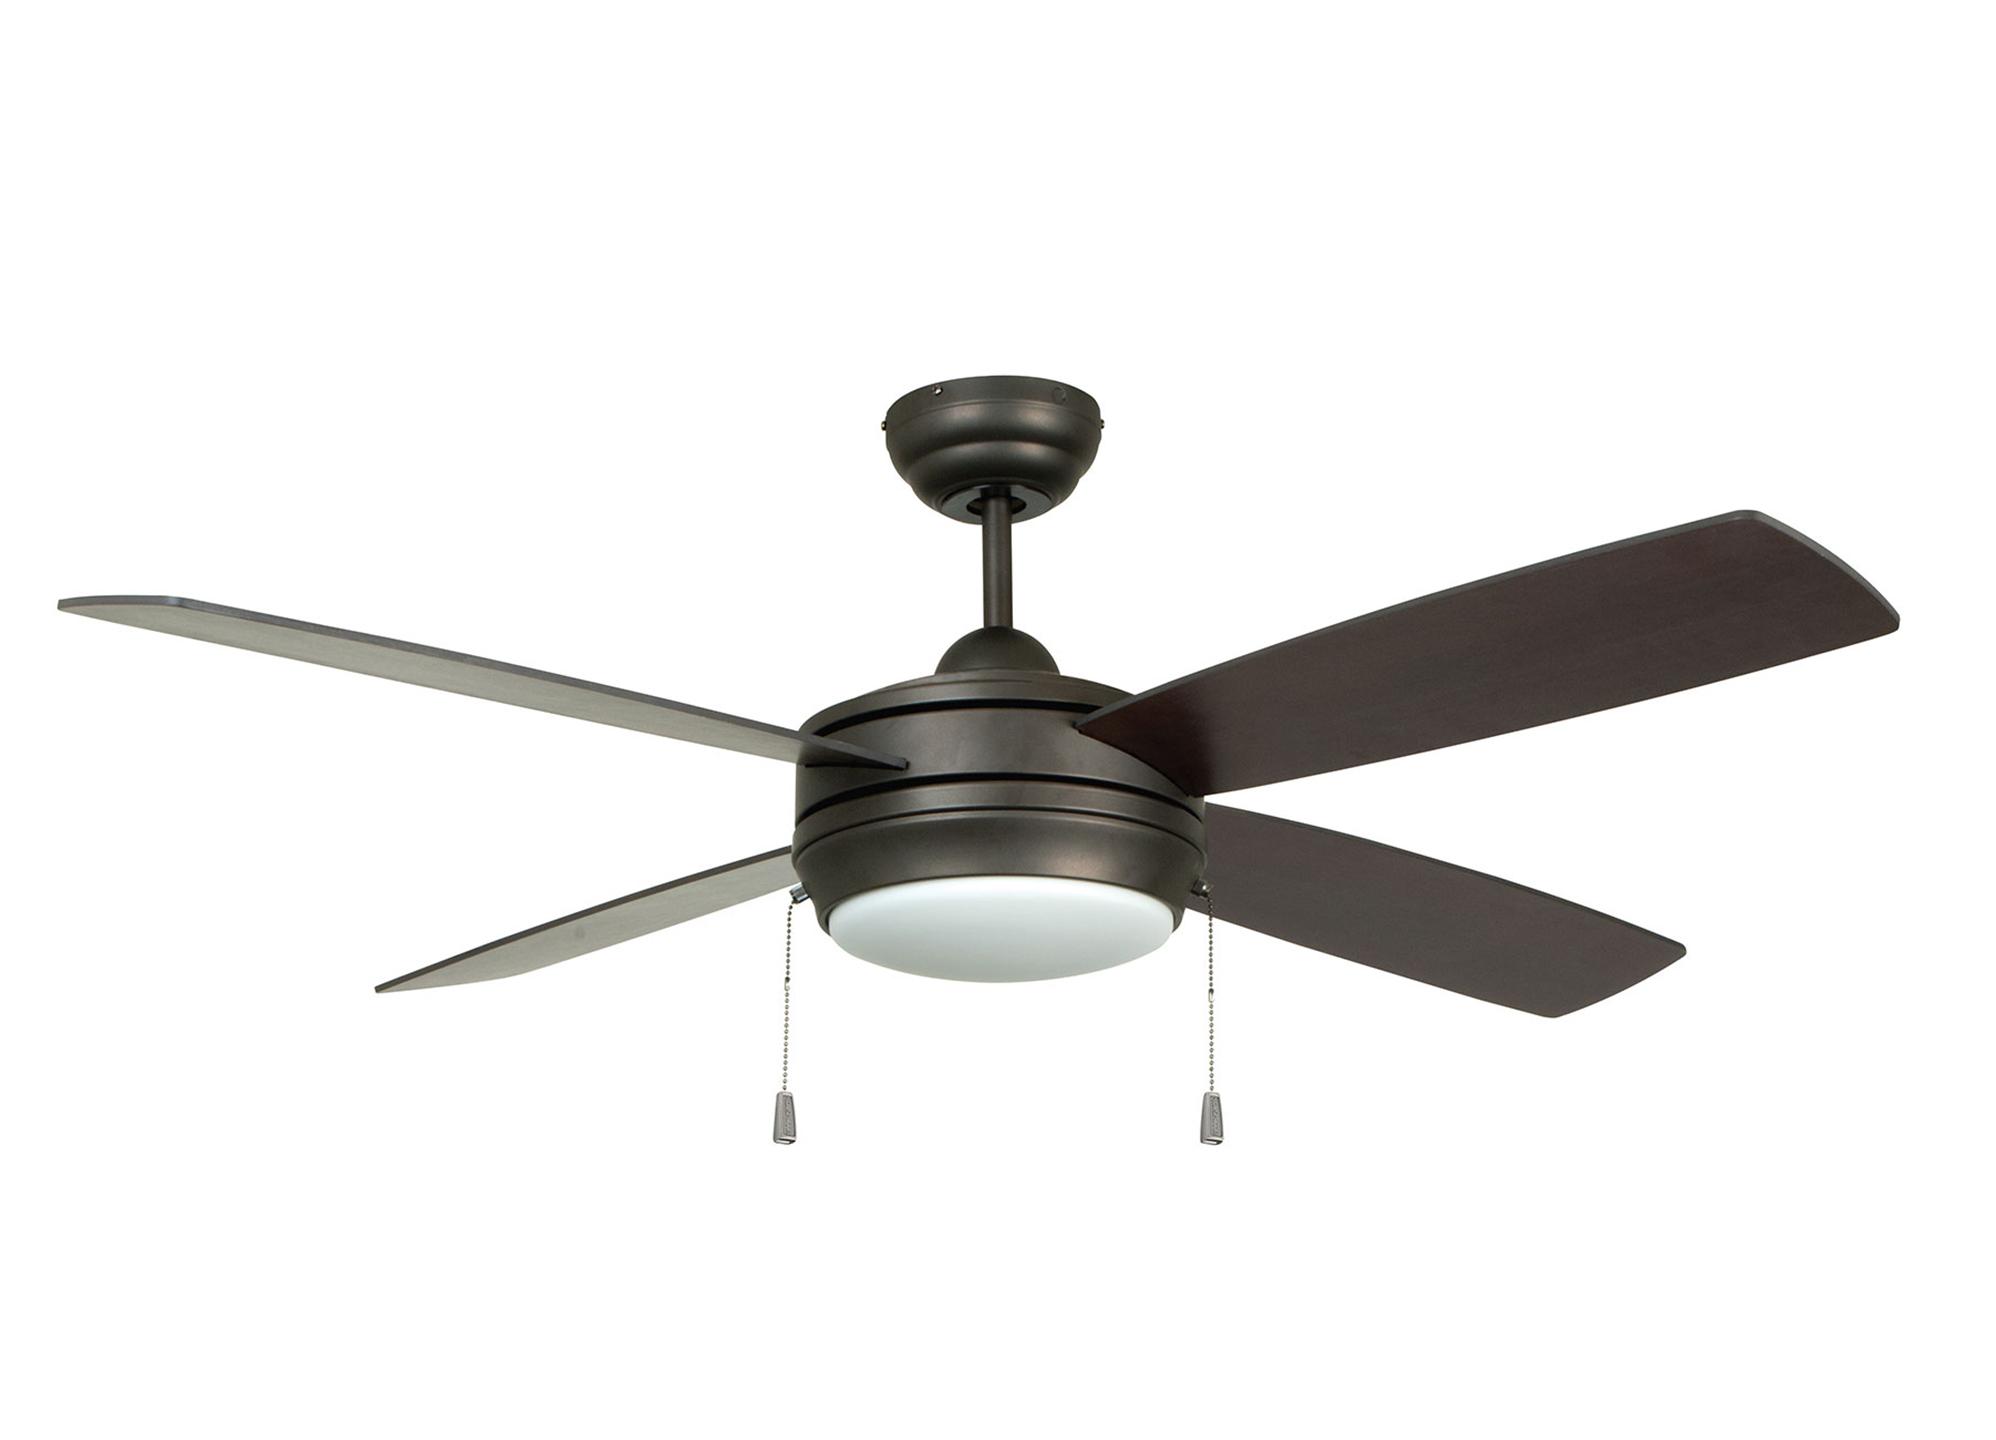 All Modern  |  Moriarty Ceiling Fan  |  $132